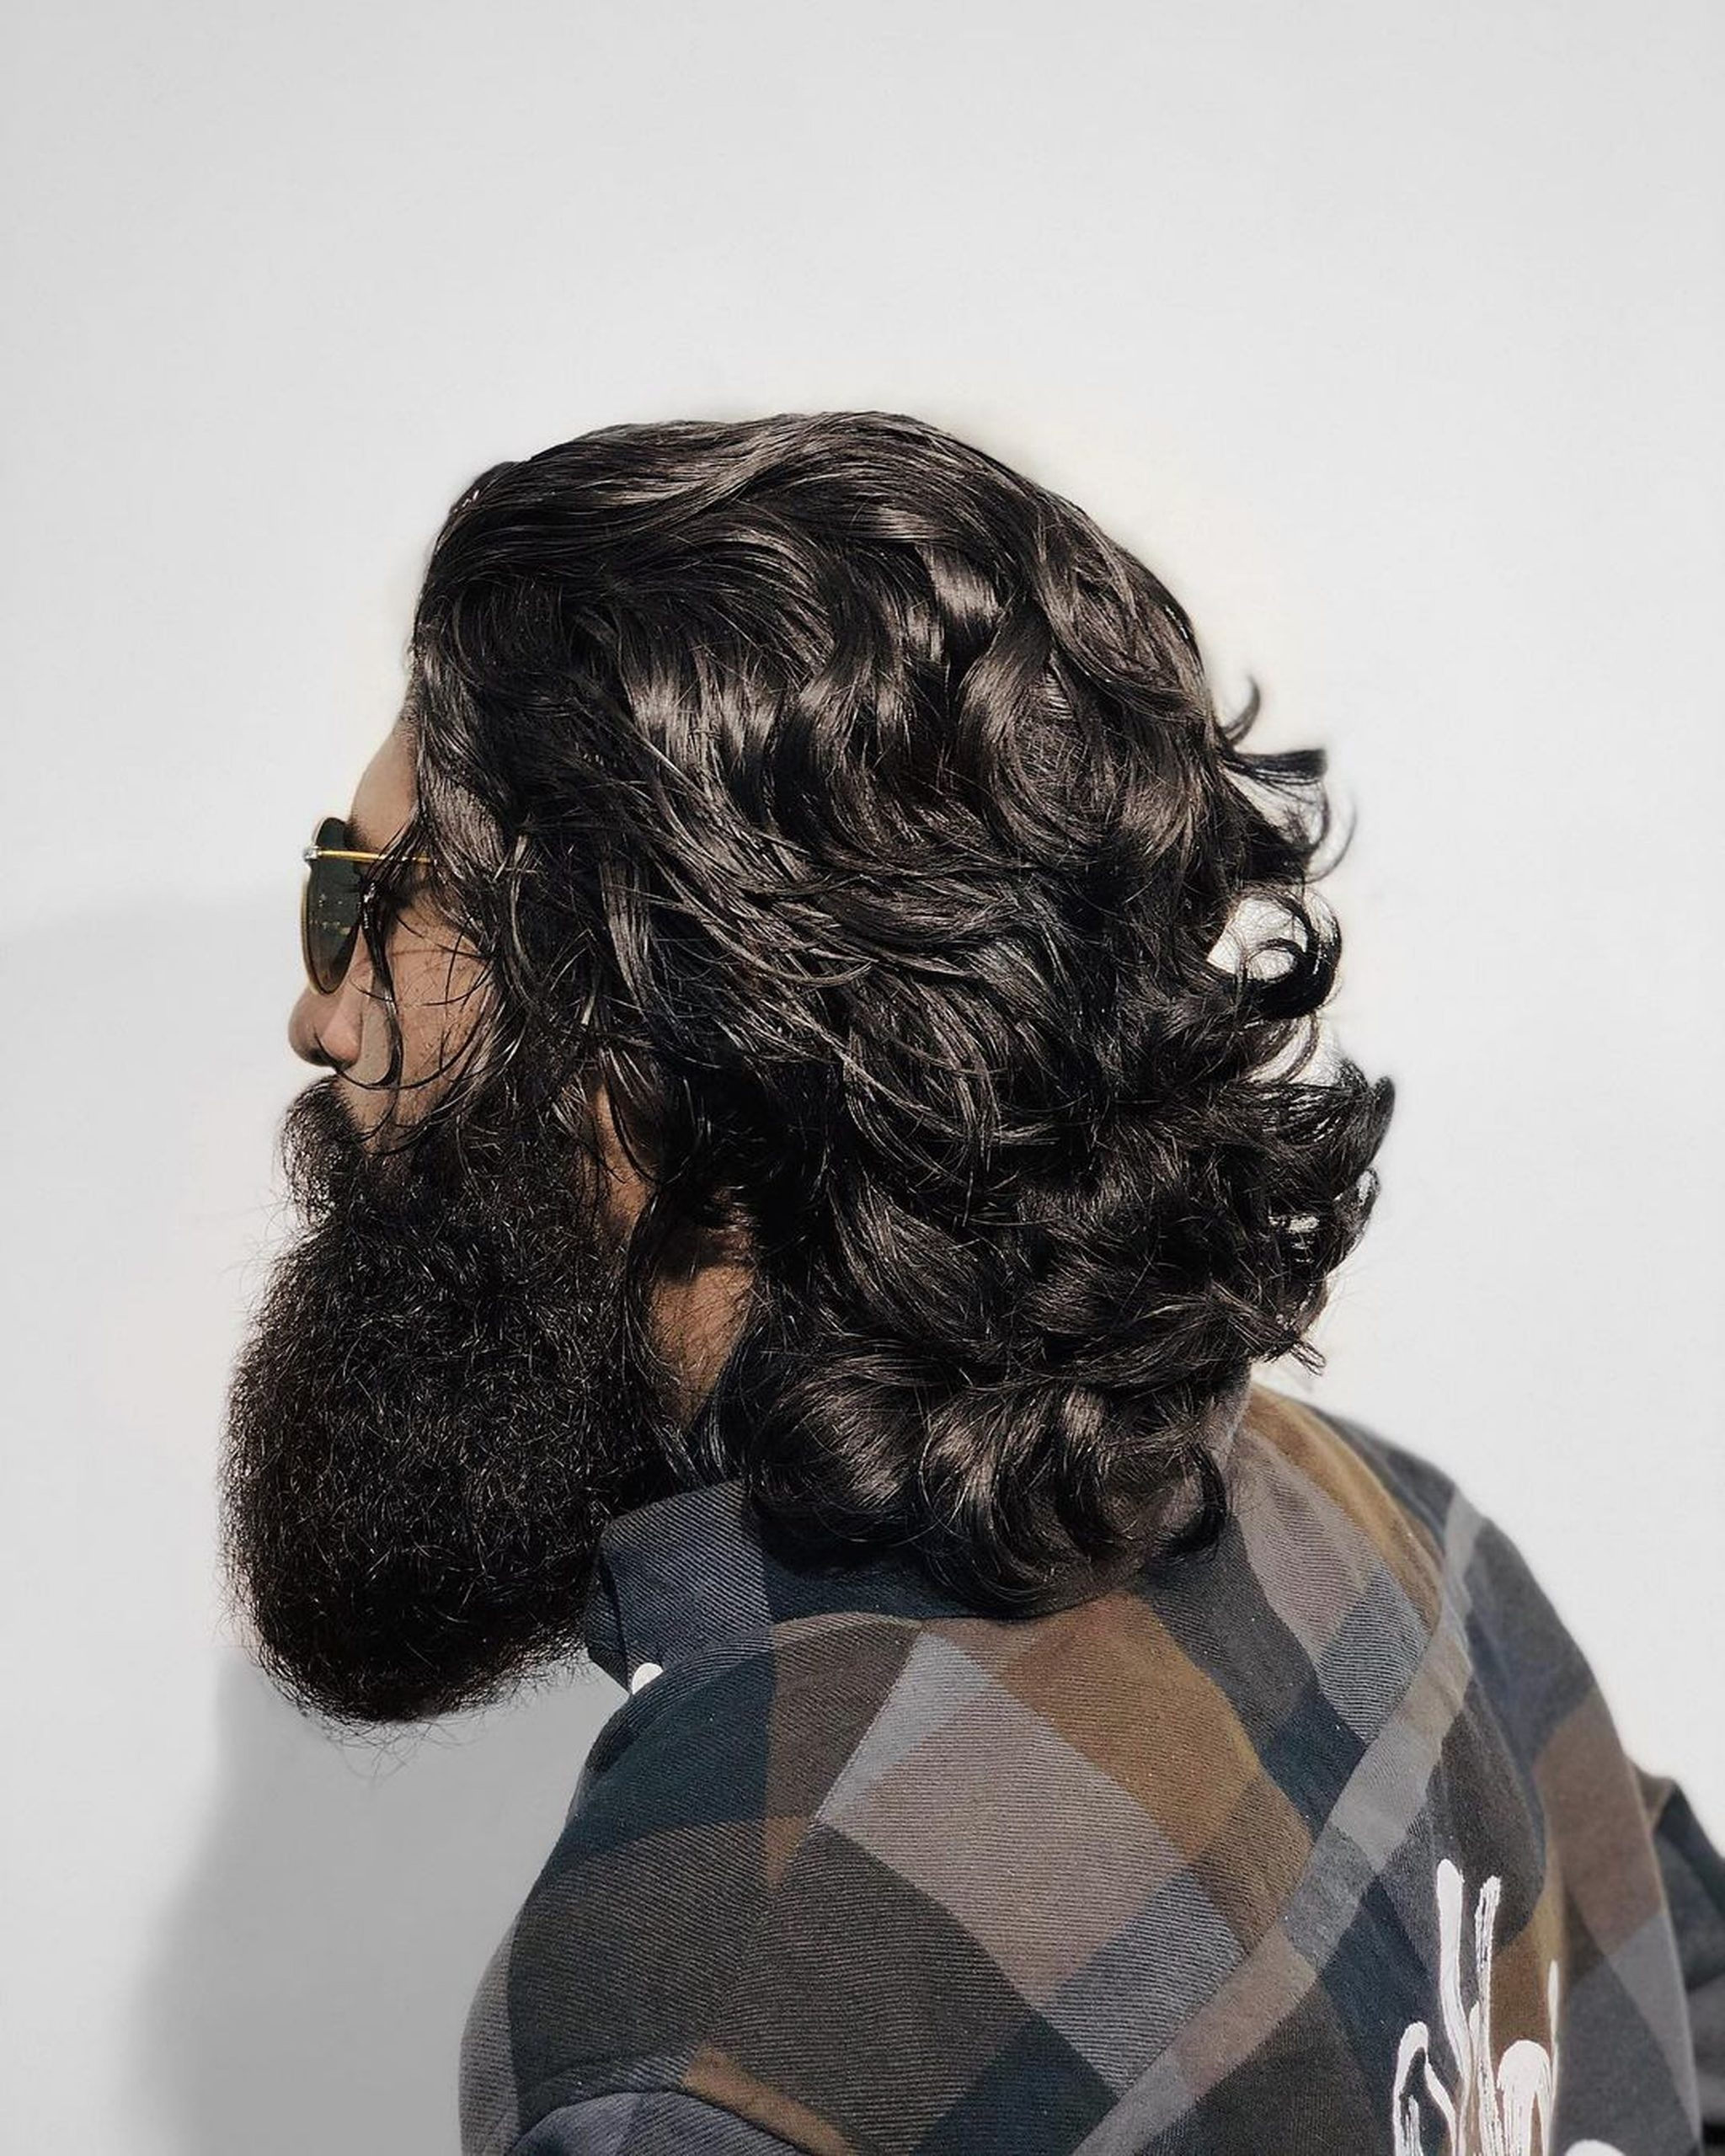 Beard man back profile